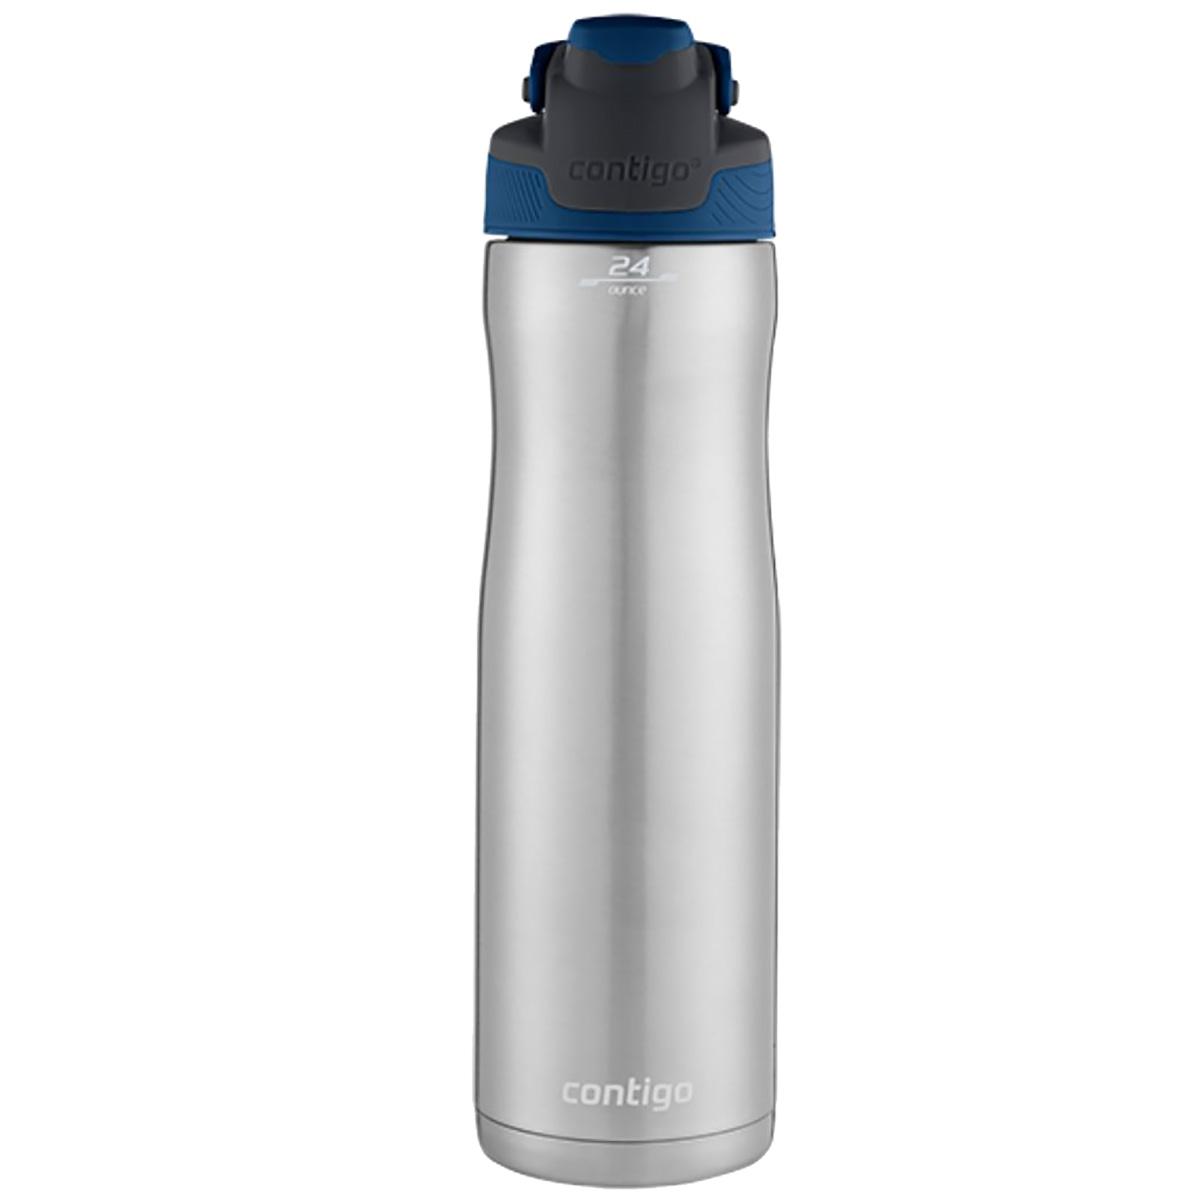 Contigo-24-oz-Chill-Autoseal-Stainless-Steel-Water-Bottle thumbnail 21